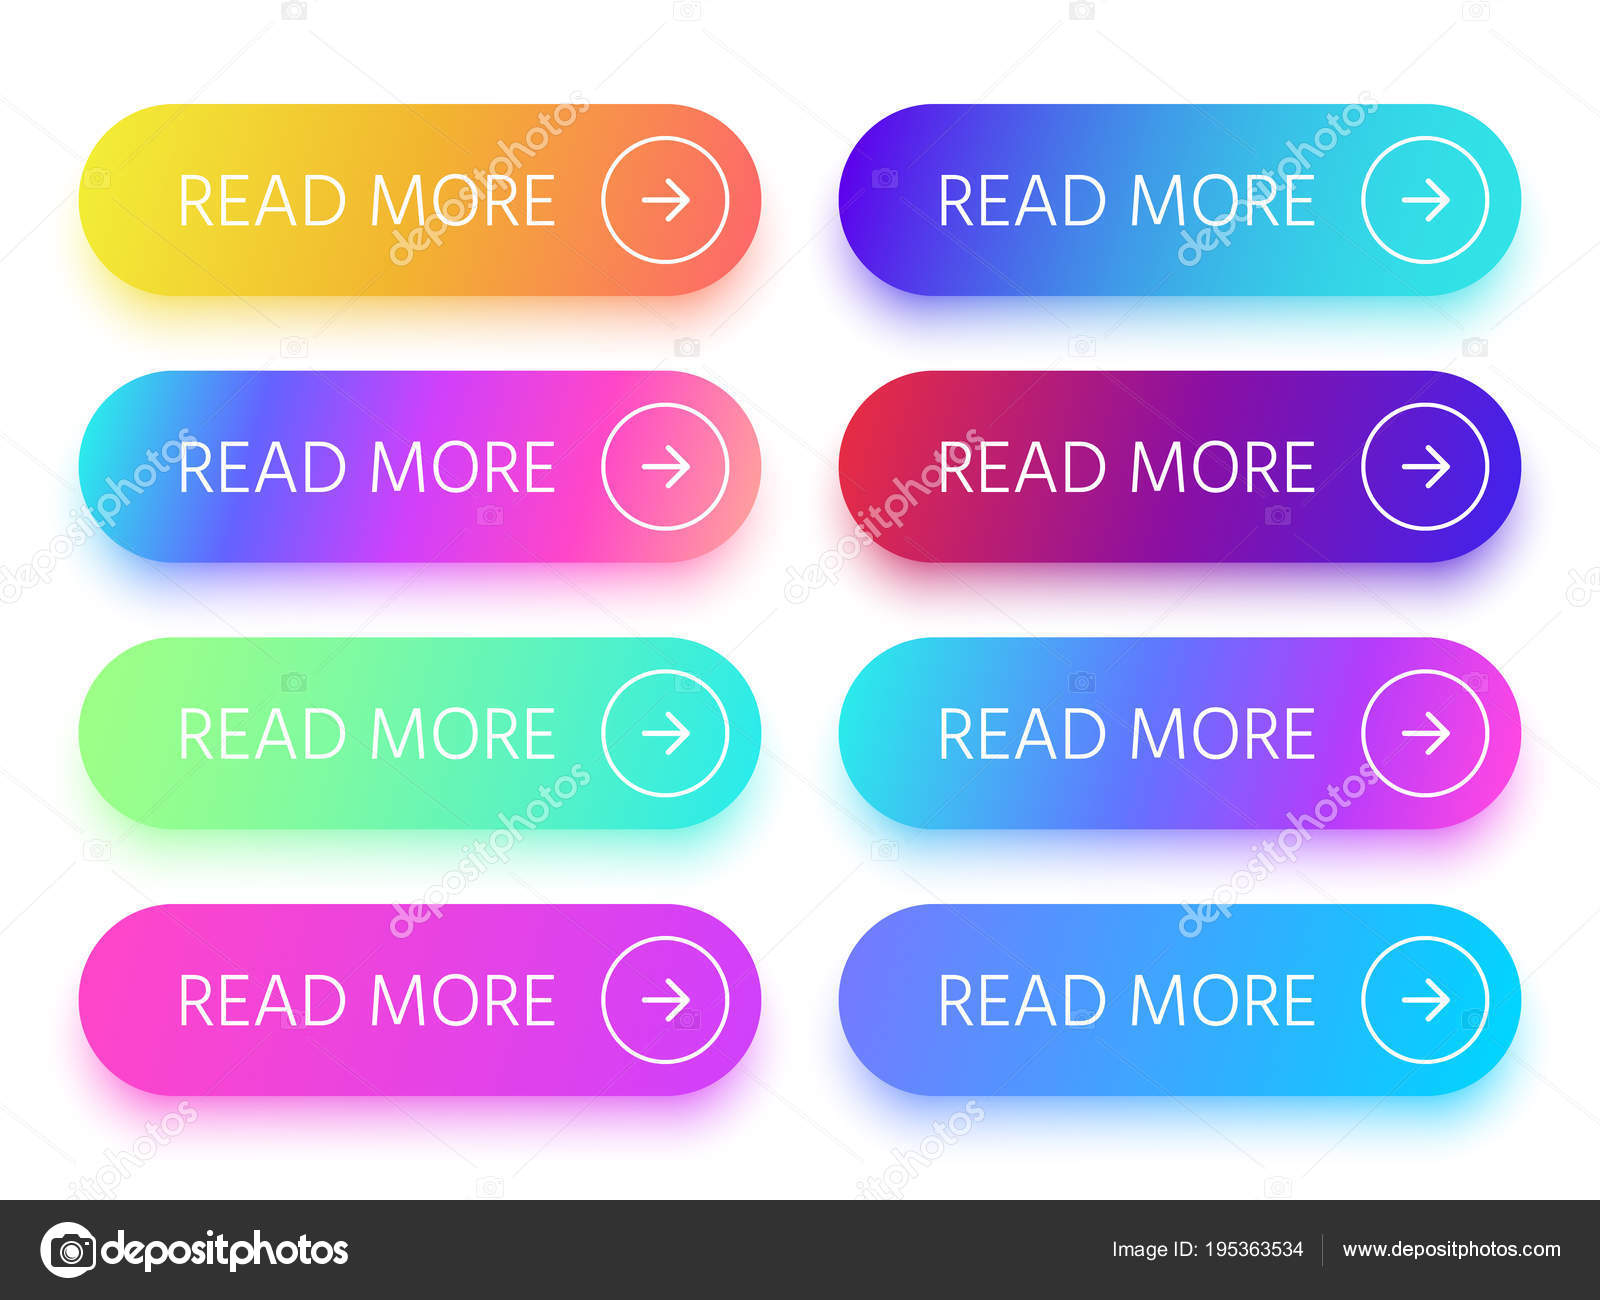 9dc478f9e8e Πολύχρωμα κουμπιά με Διαβάστε περισσότερα σημάδι και βέλος εικονίδιο.  Κουμπί προτροπής με έντονα ντεγκραντέ απομονωμένες